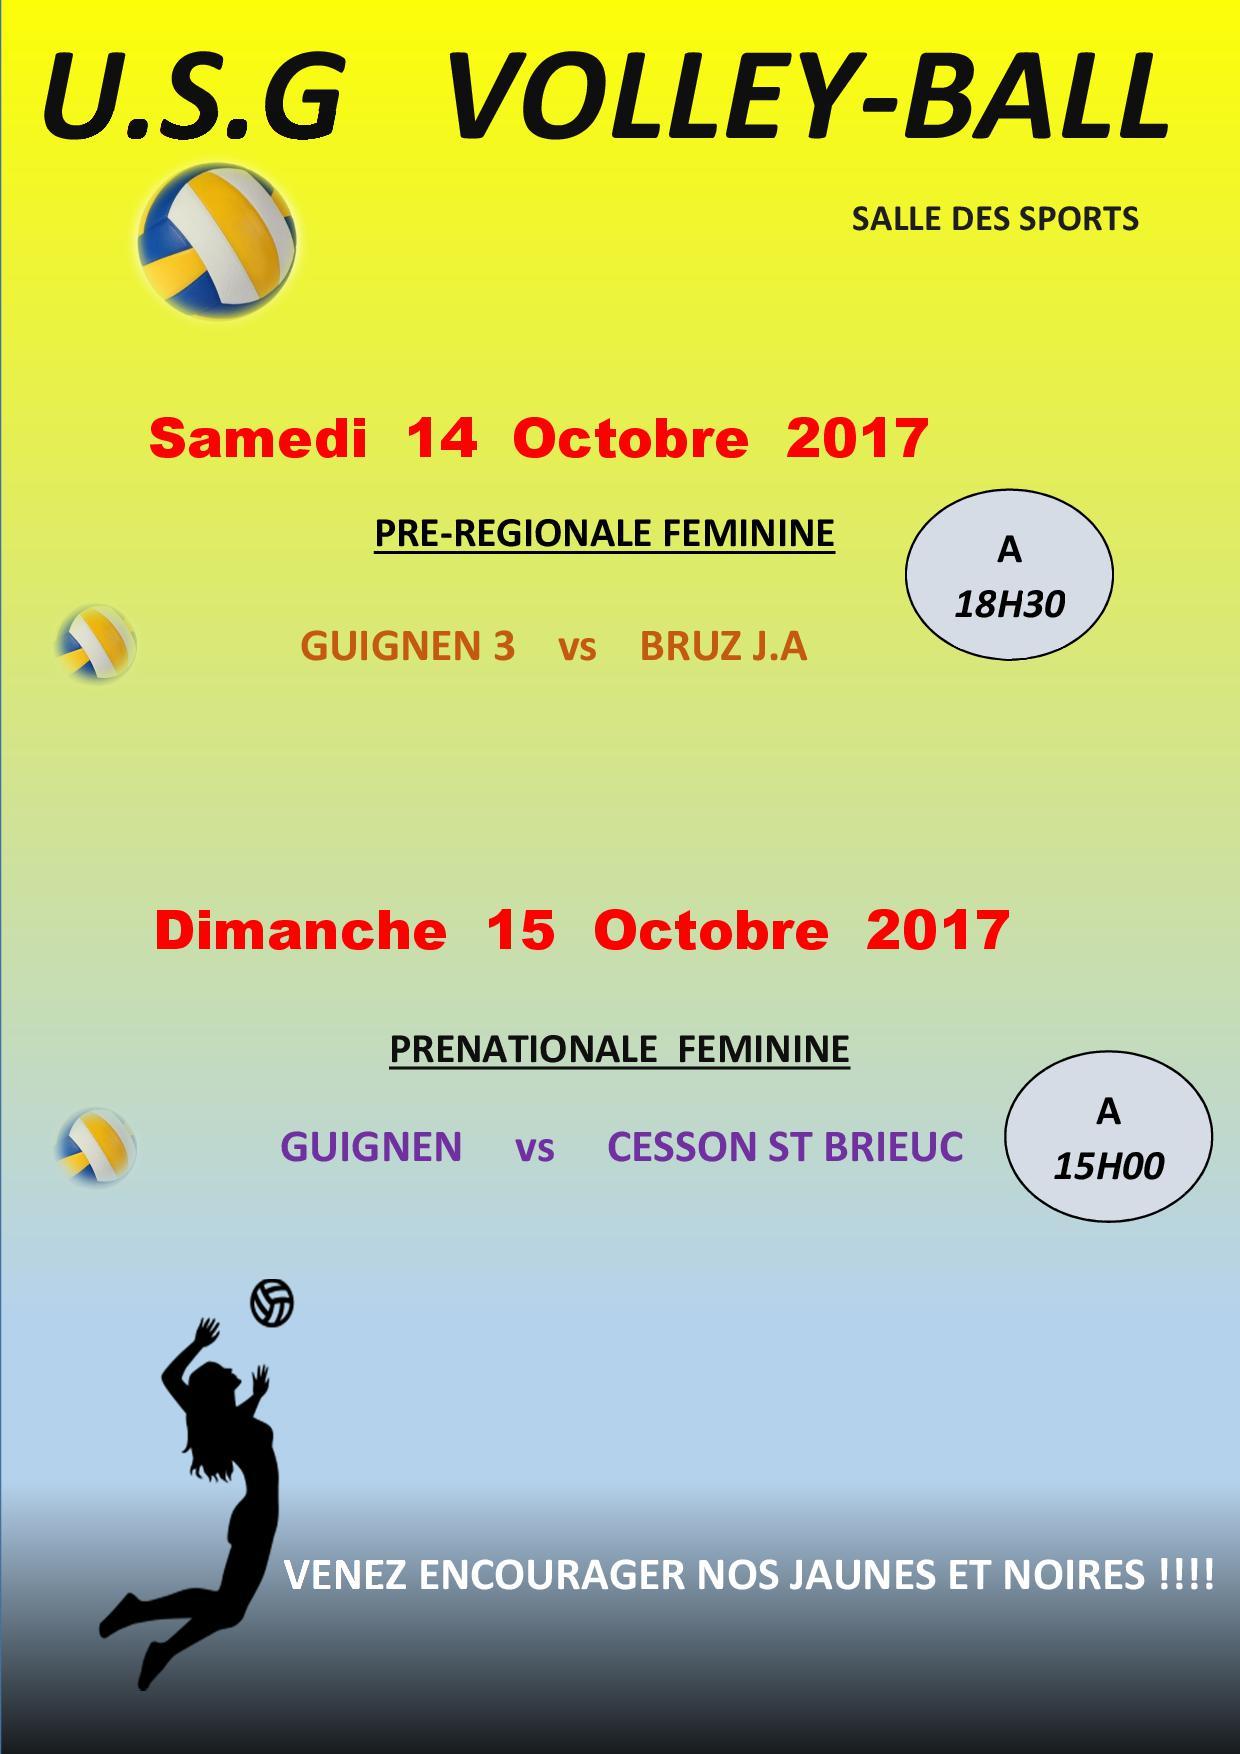 AFFICHE VOLLEY du 14-15 Octobre 2017.jpg